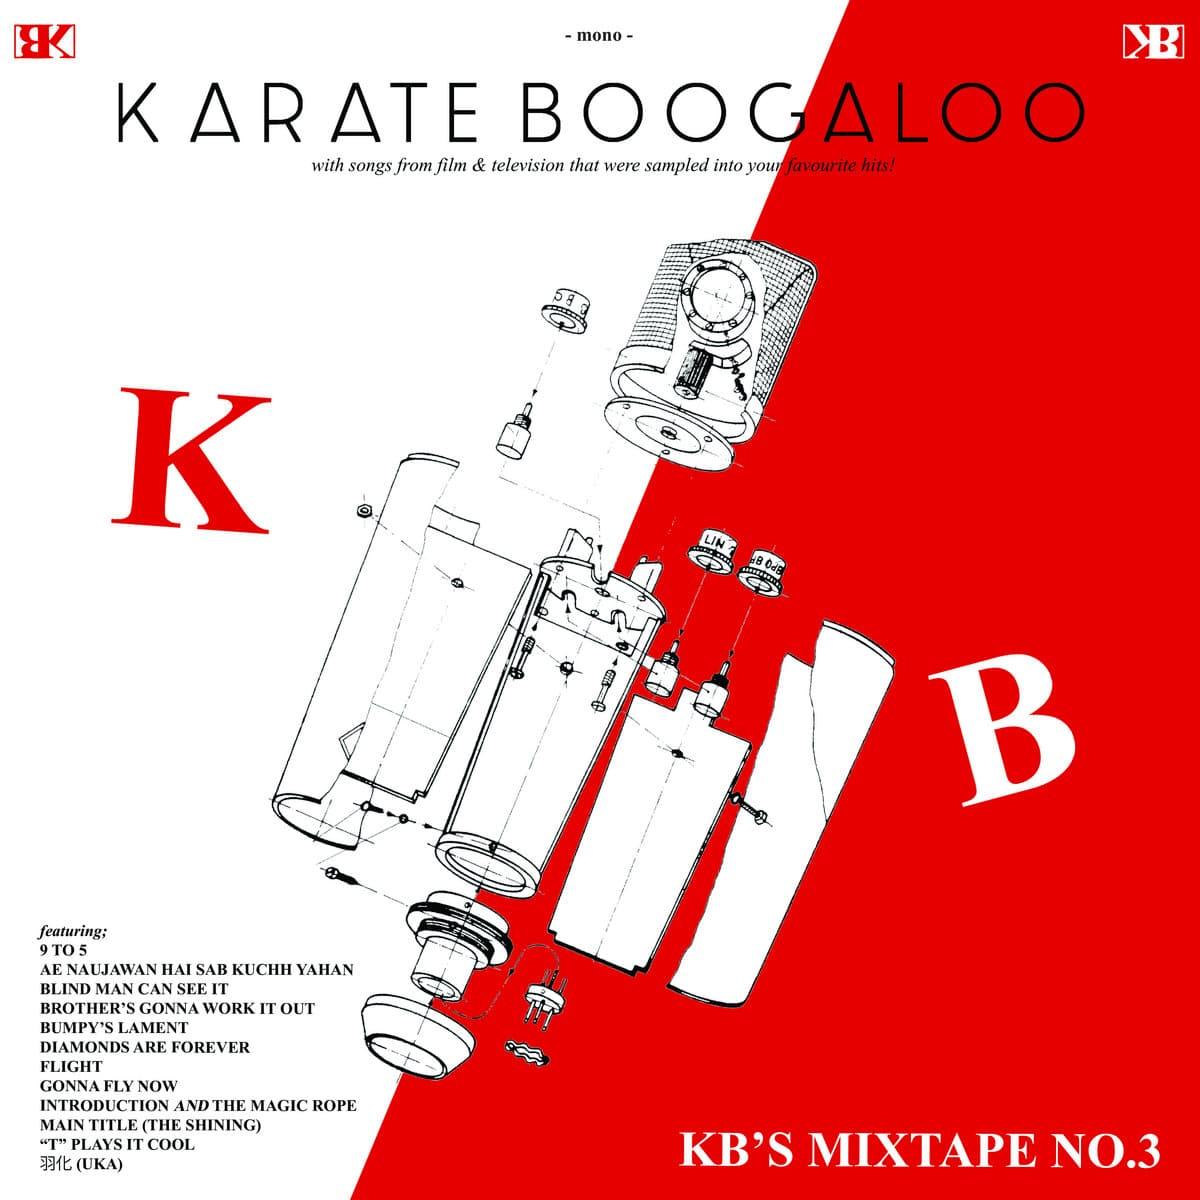 Karate Boogaloo - KB's Mixtape No. 3